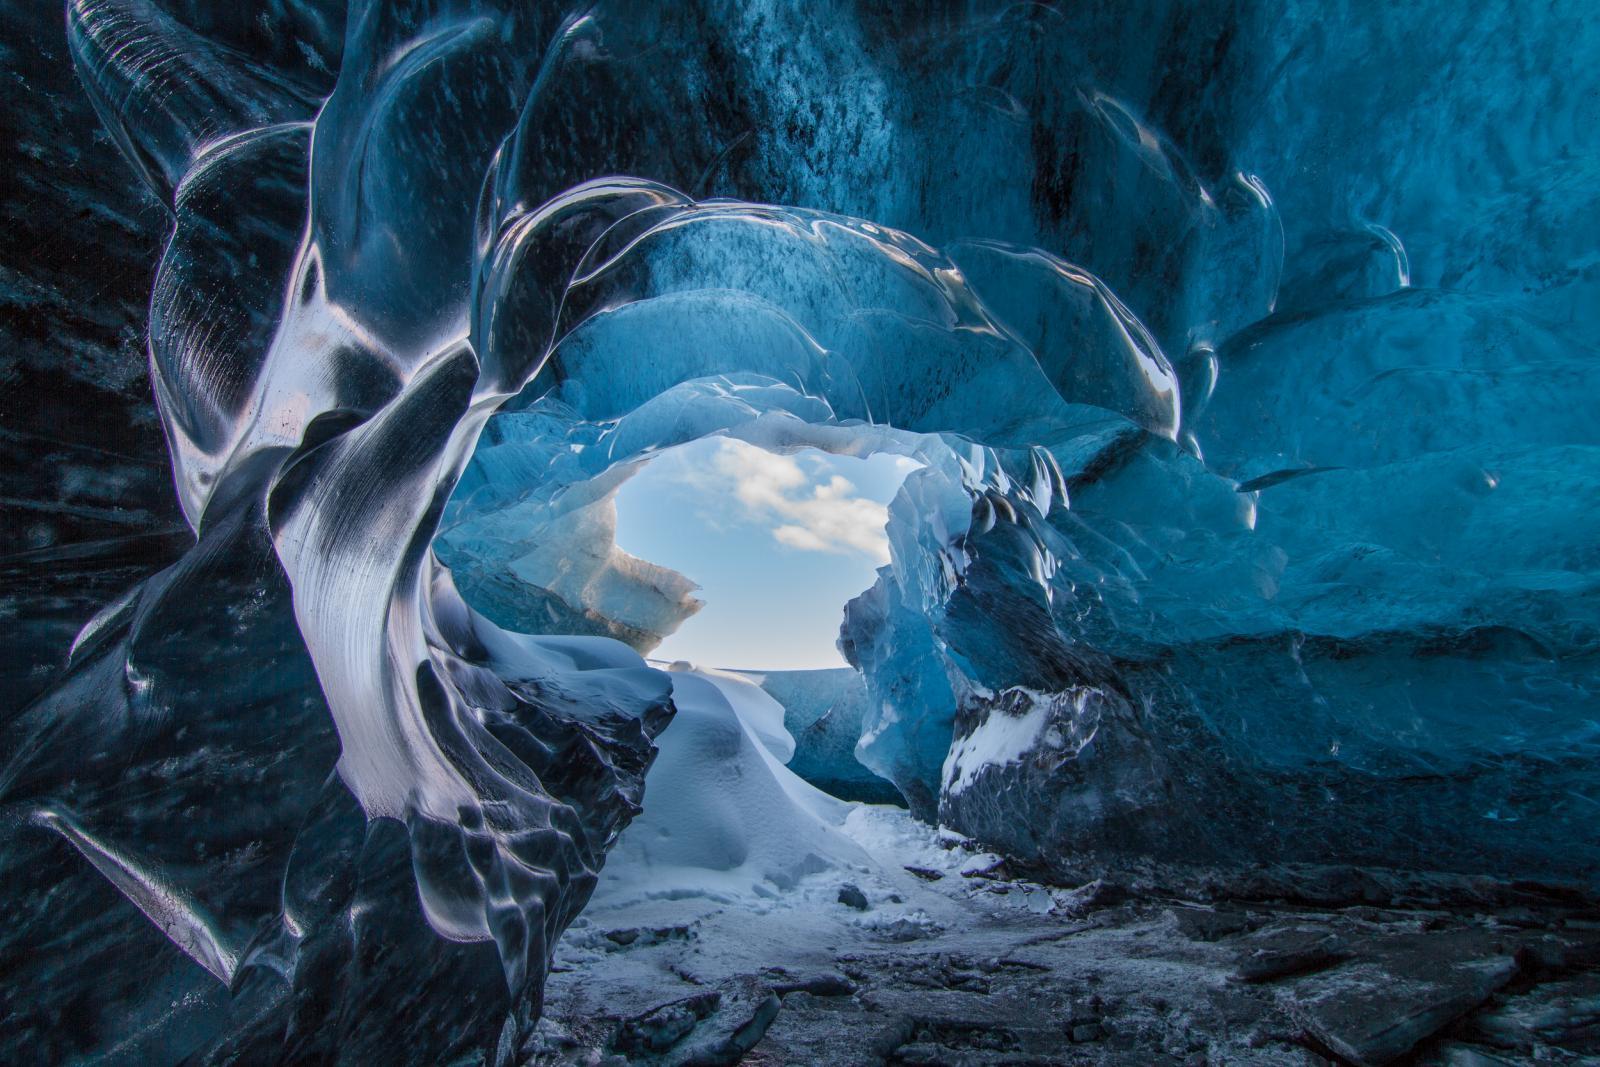 beautiful ice formation ice cave claidio ciceri